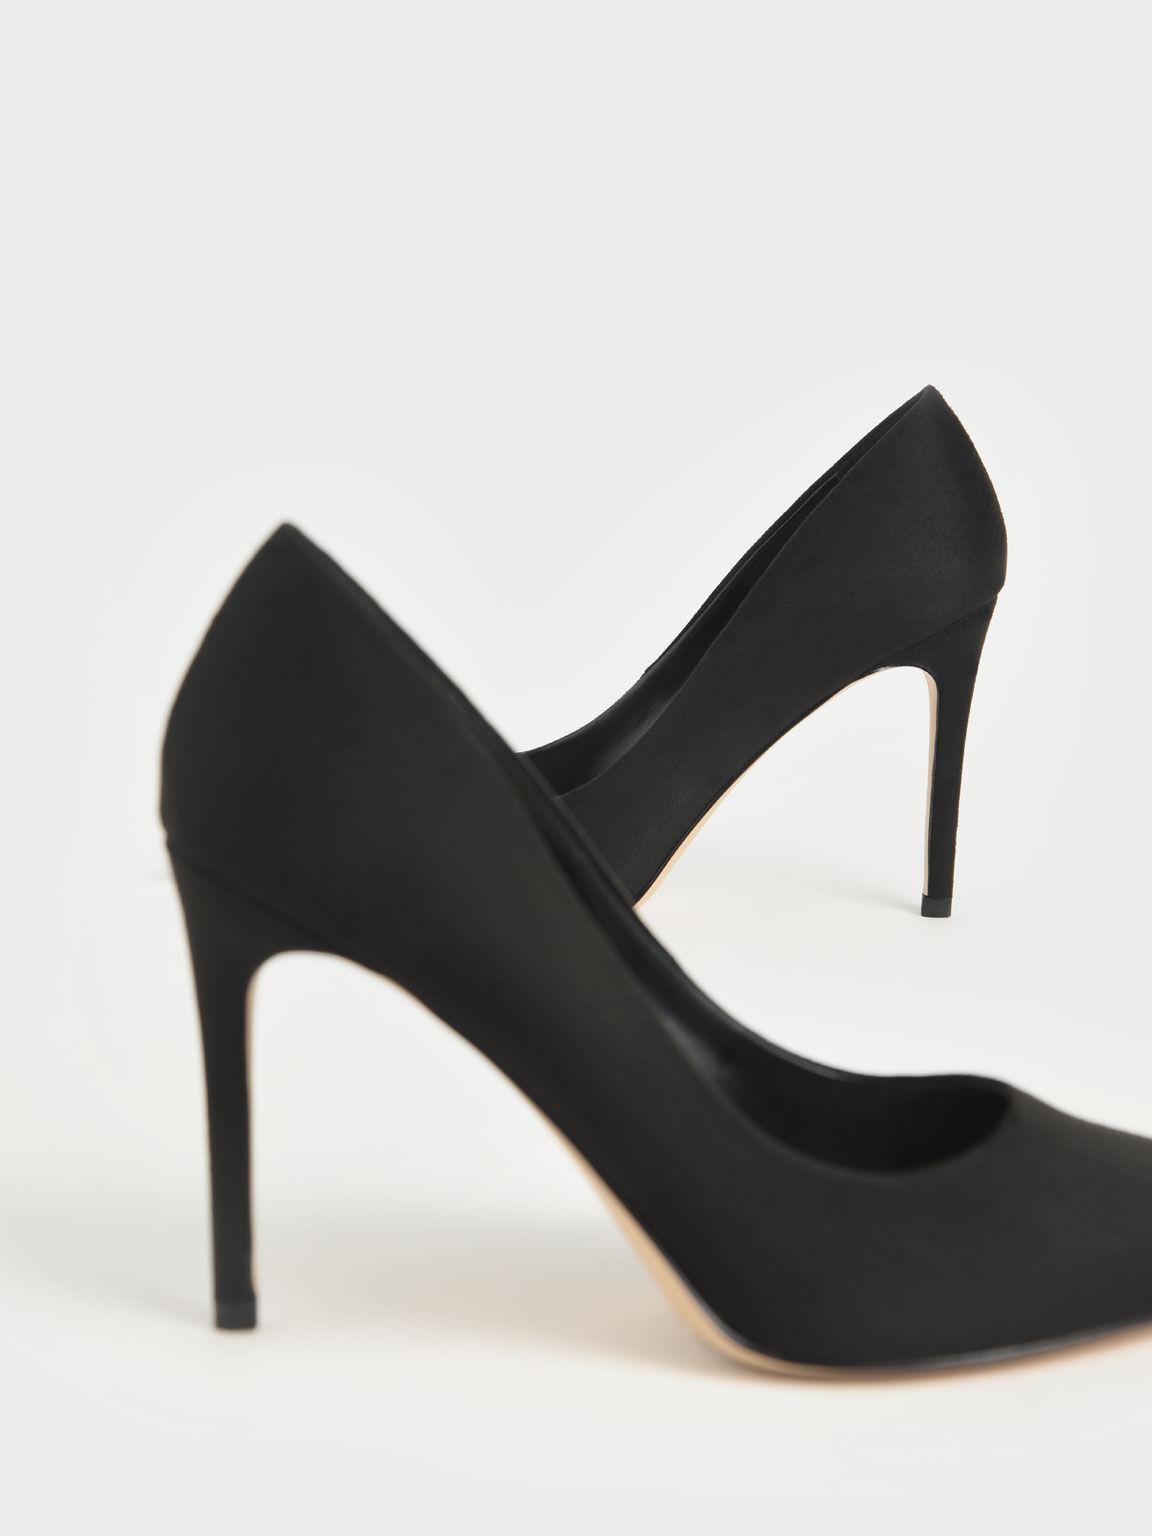 Textured Stiletto Heel Pumps, Black, hi-res